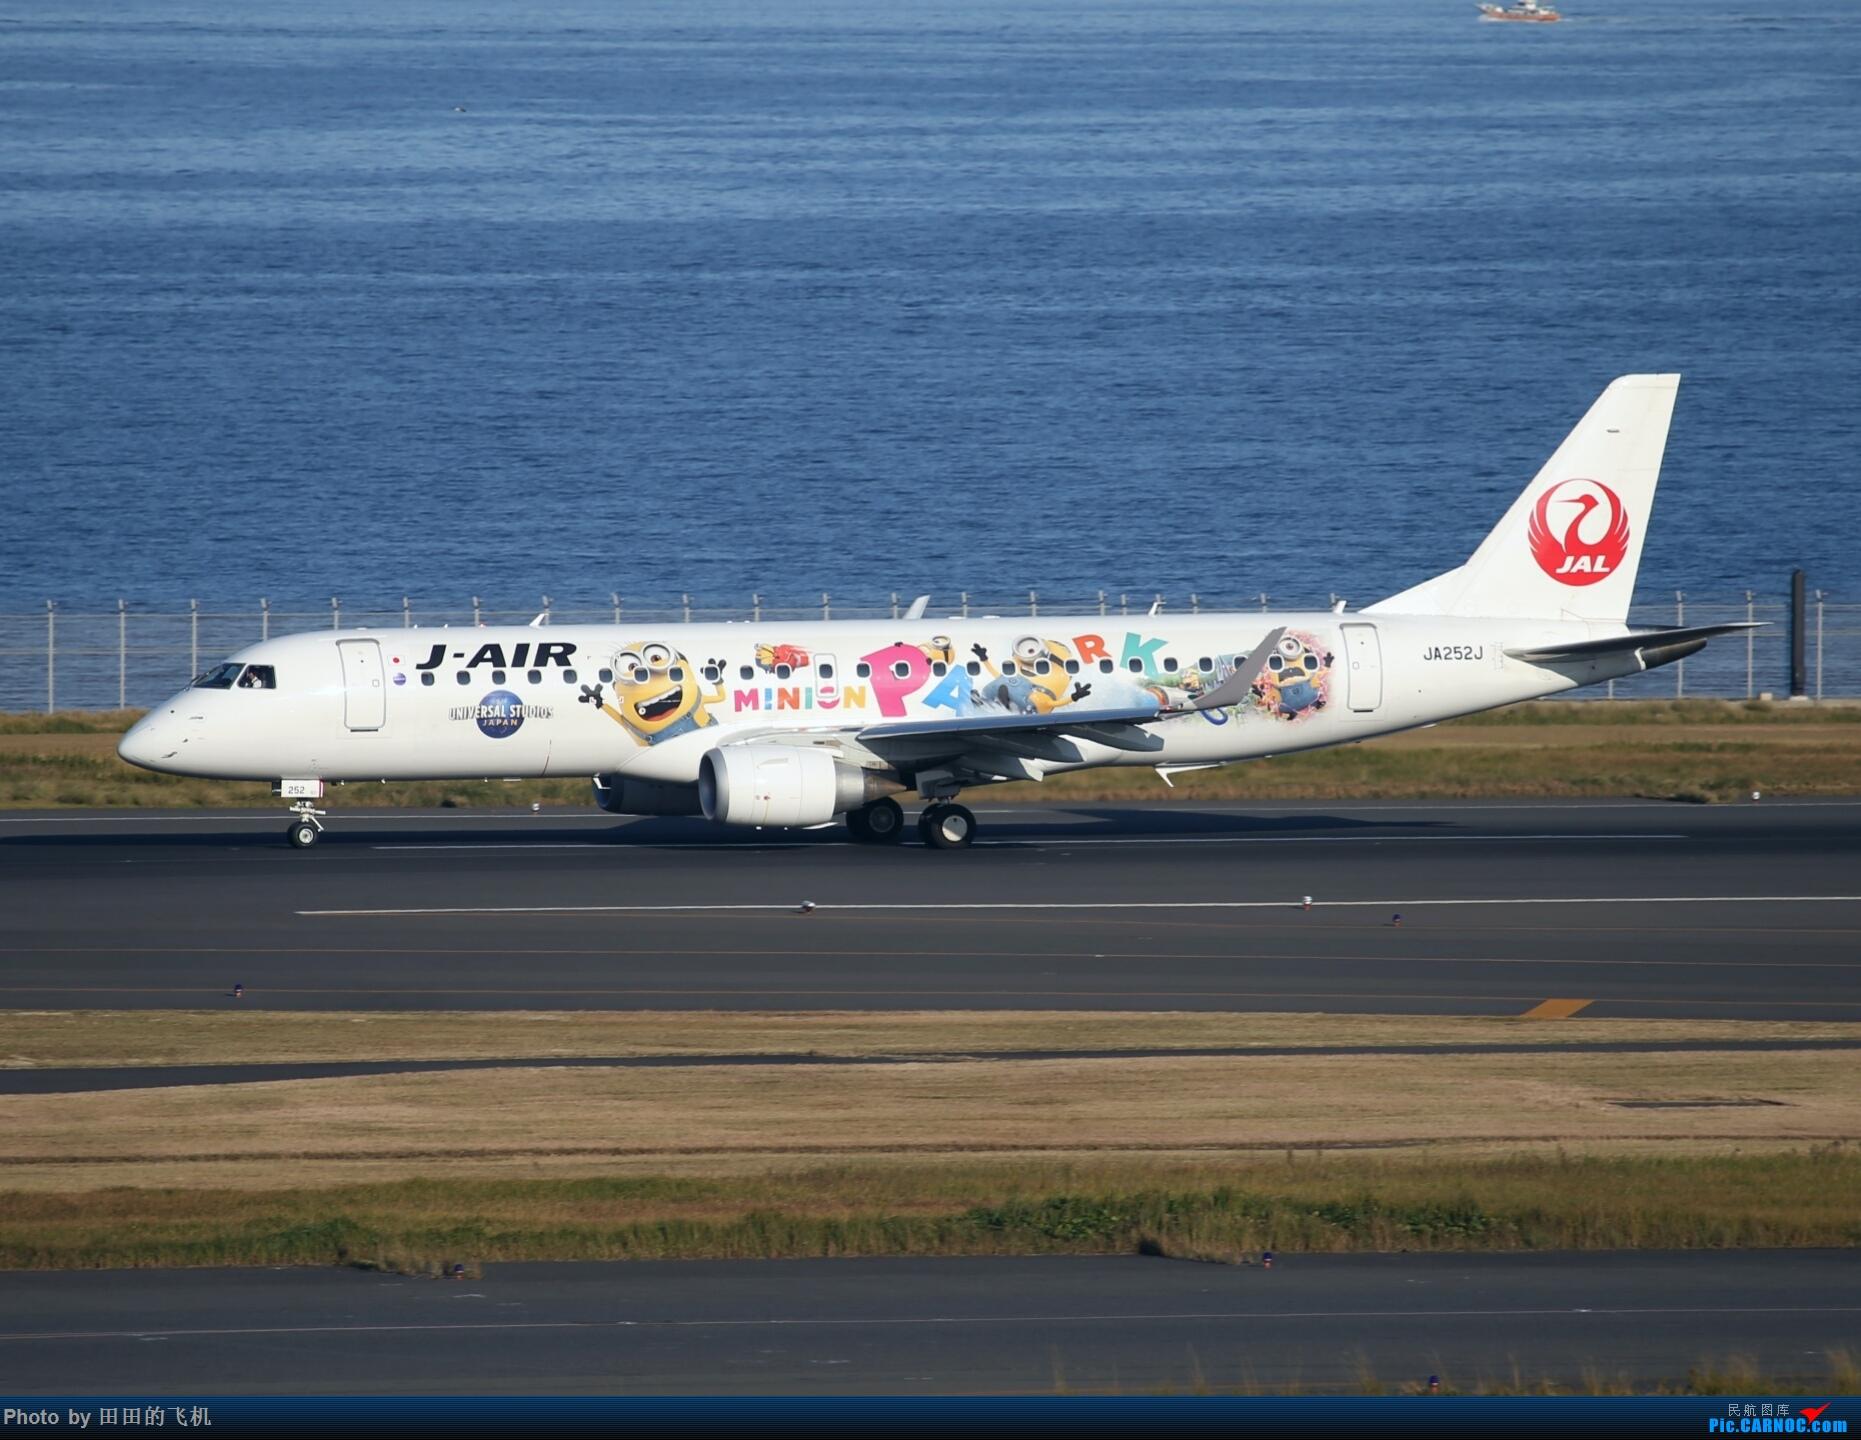 Re:[原创]整理一下去年东京羽田机场拍的飞机 E-190 JA252J 东京羽田机场